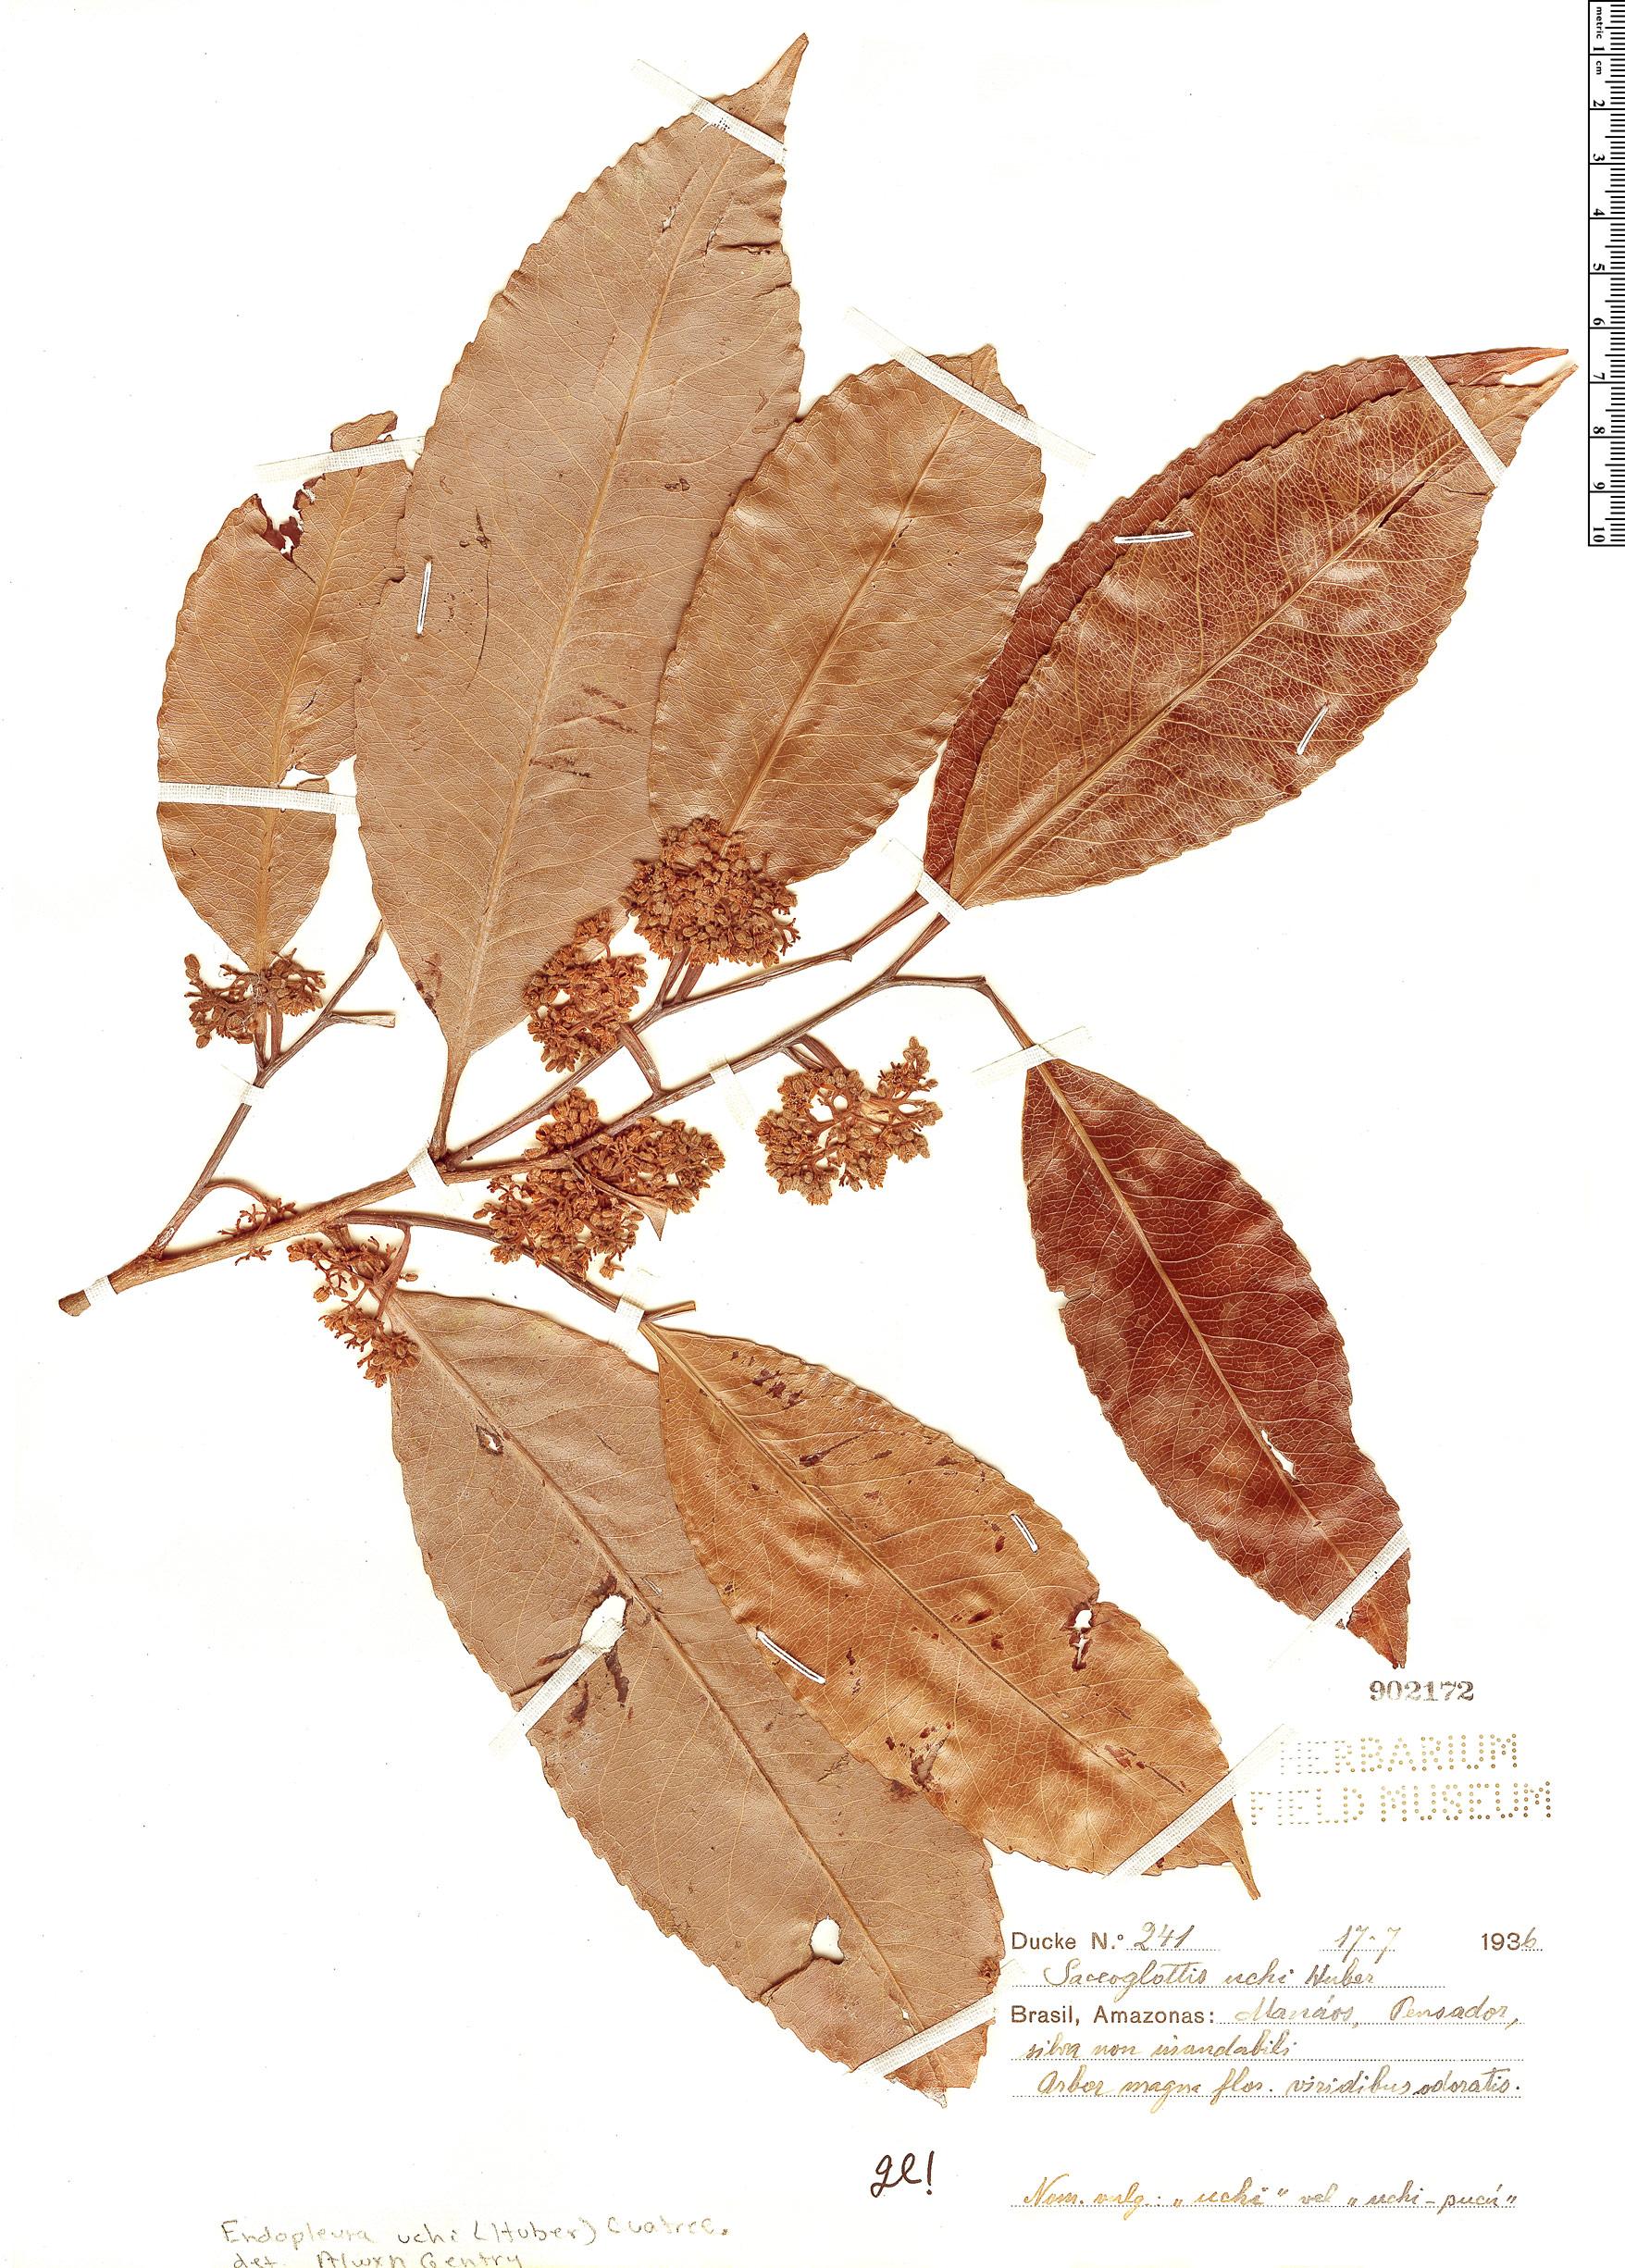 Specimen: Endopleura uchi